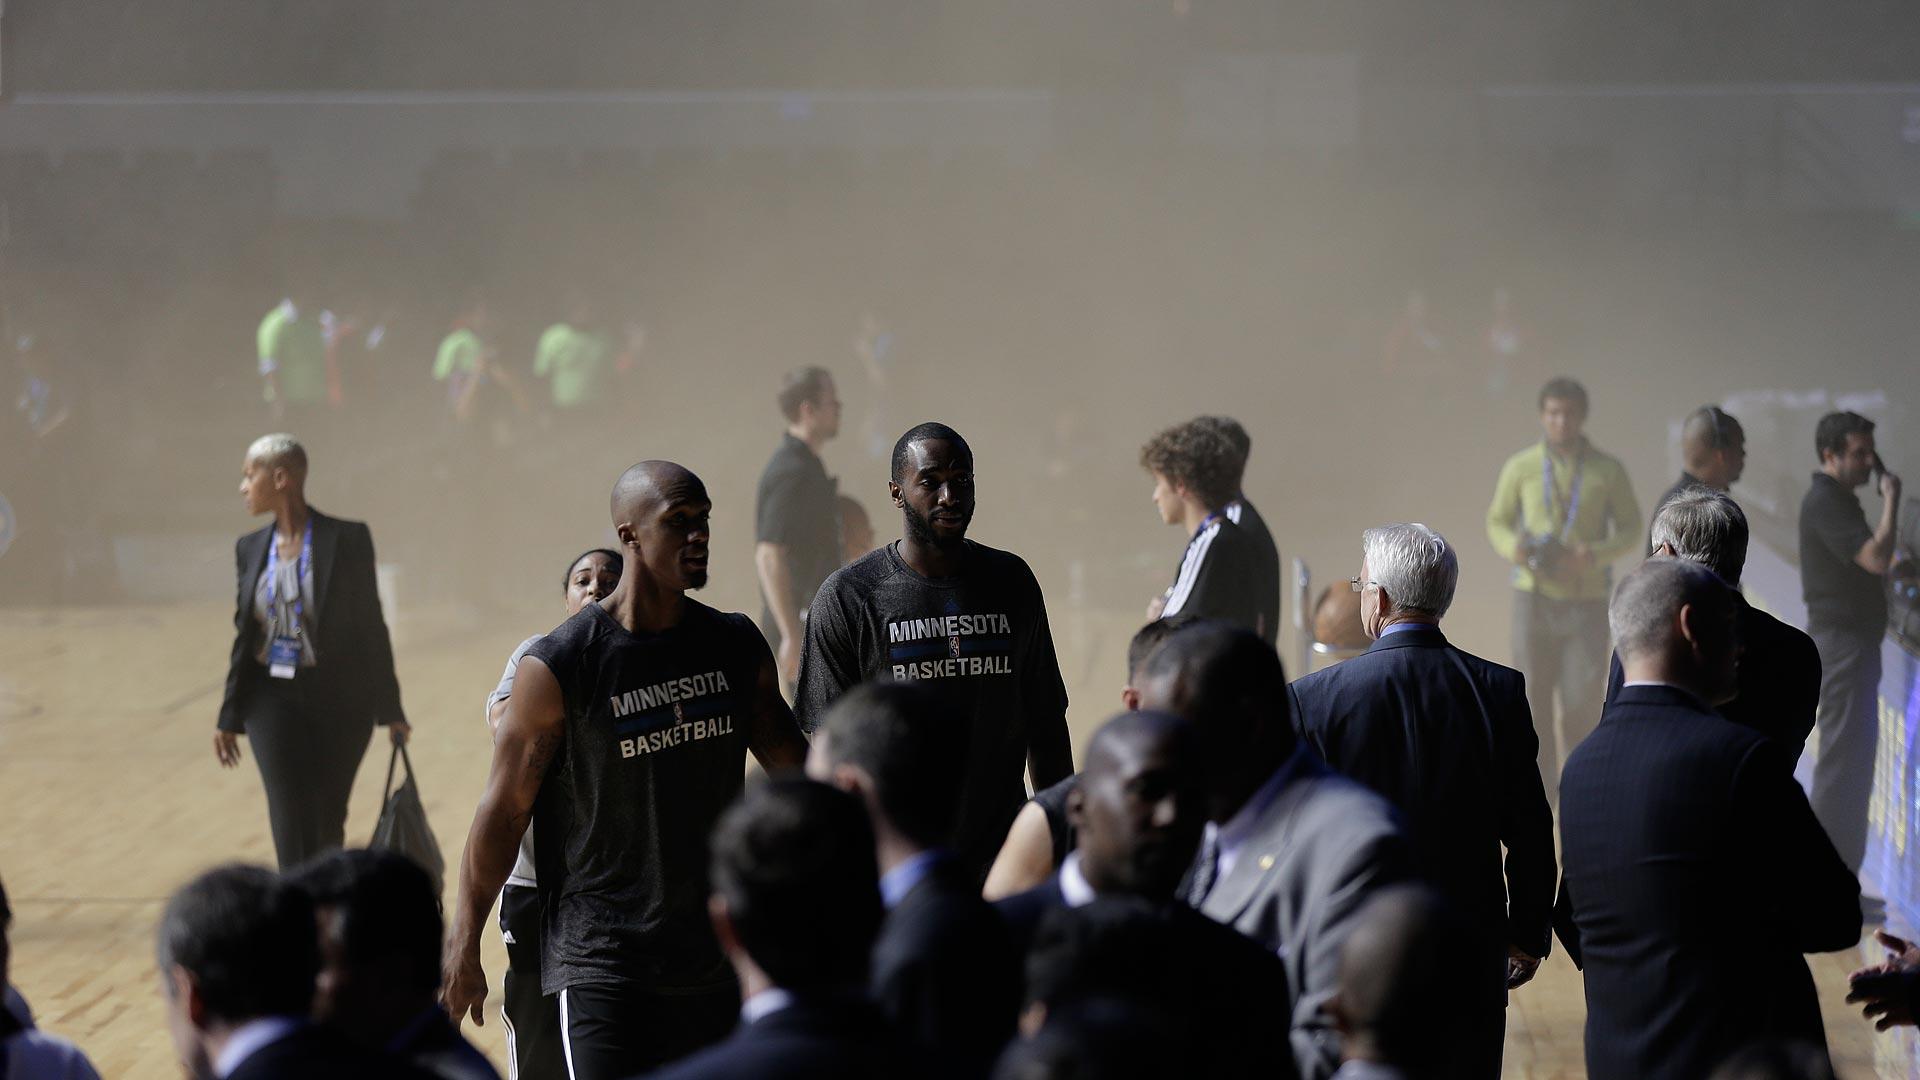 Timberwolves smoke-120413-AP-FTR.jpg